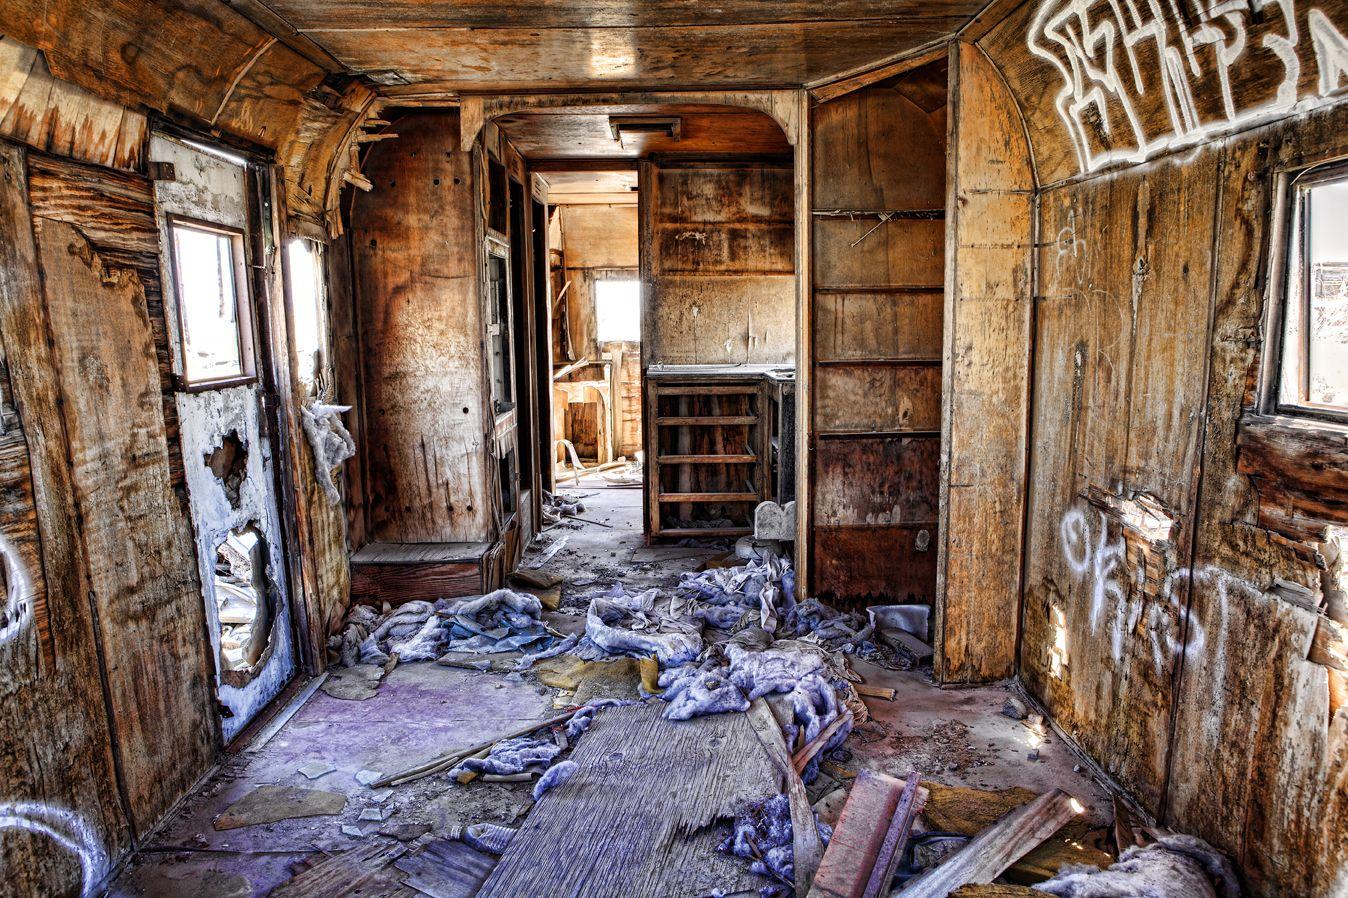 Abandoned Trailer Salton Sea CA